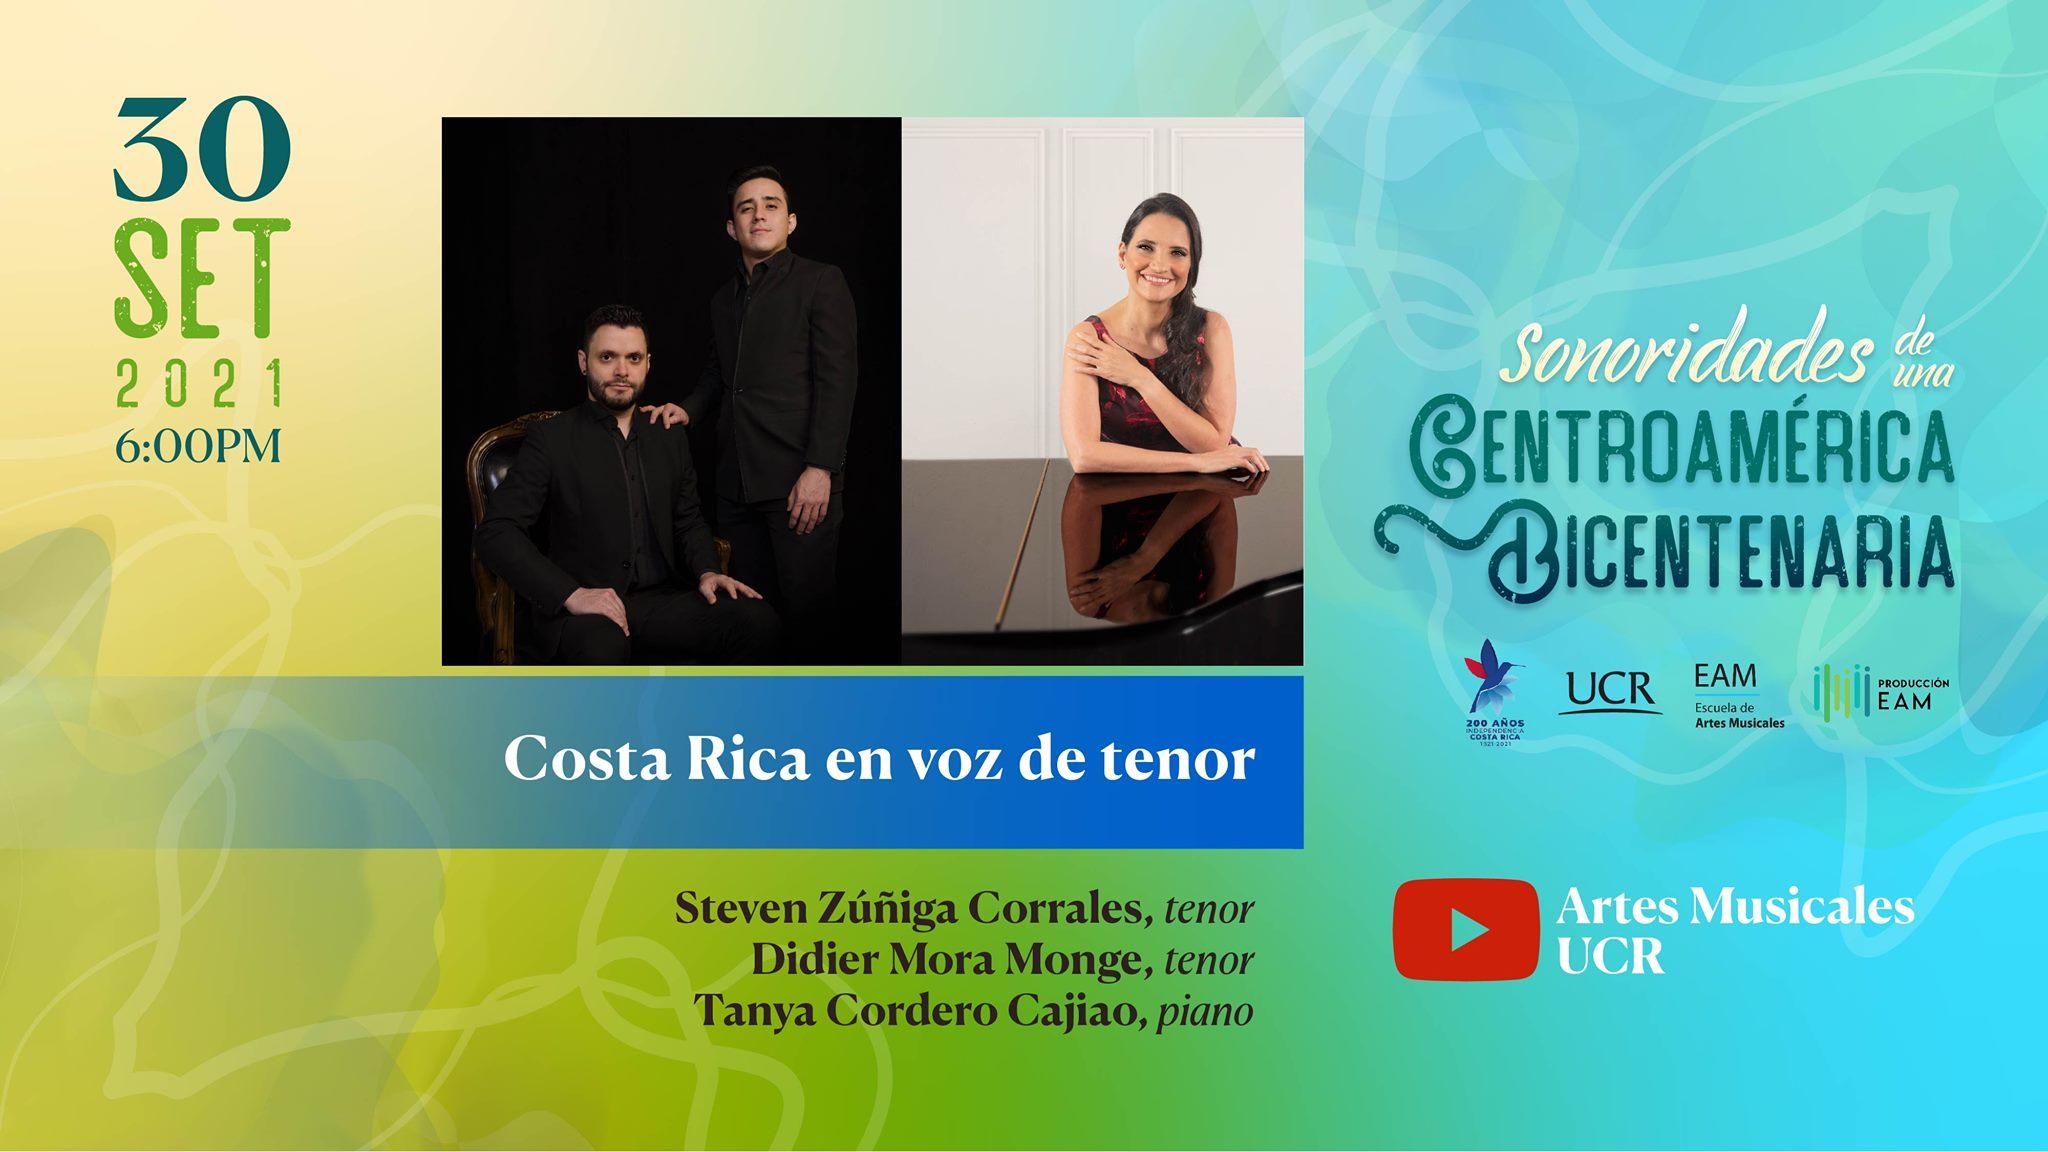 Costa Rica en voz de tenor